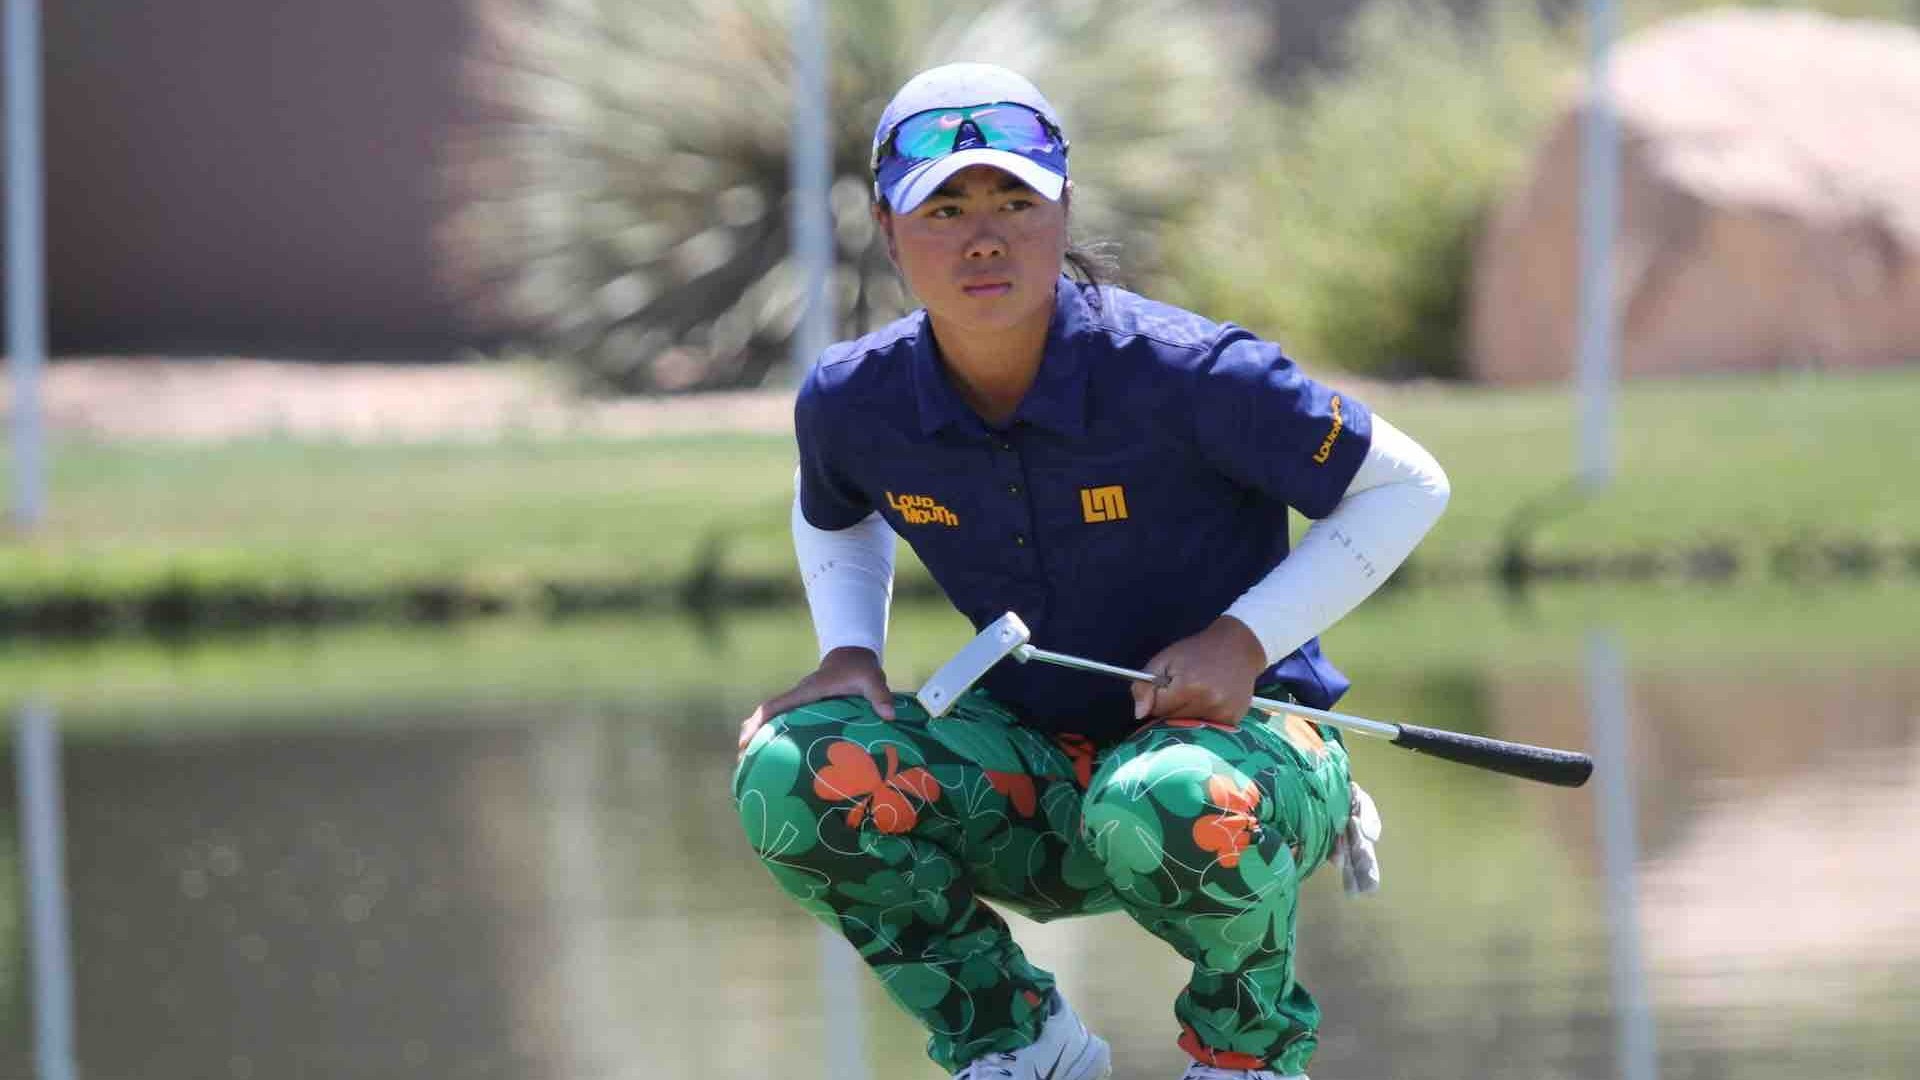 Yuka Saso Wins Thunderbird